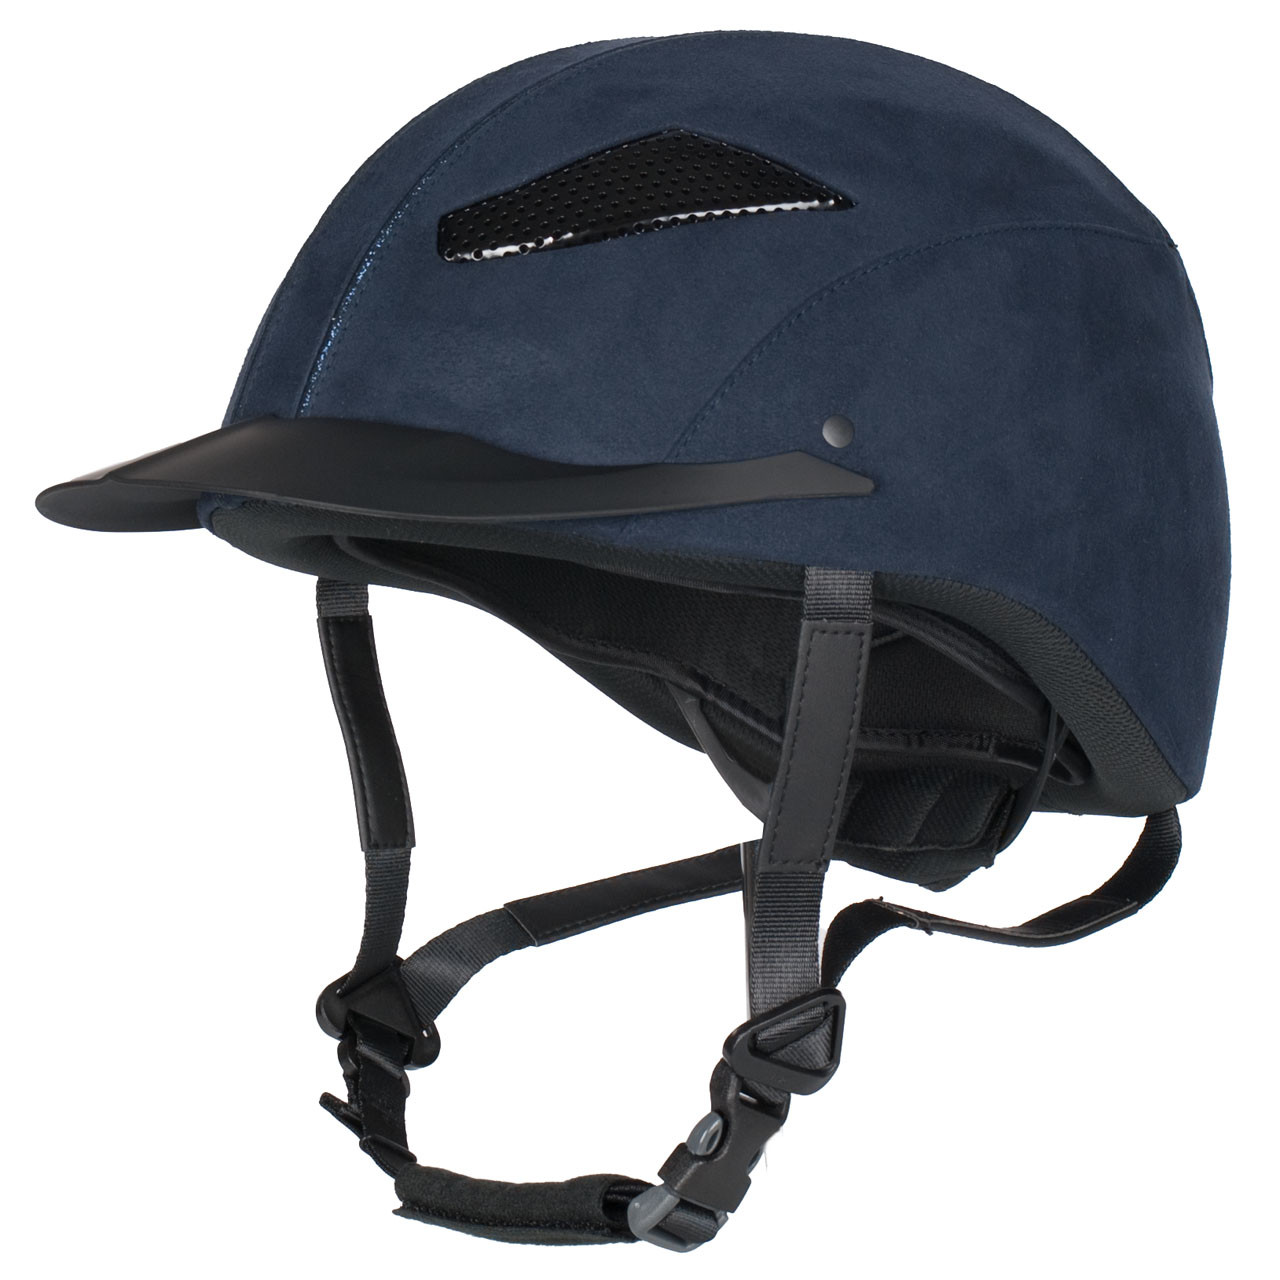 QHP Attraction cap donkerblauw maat:l